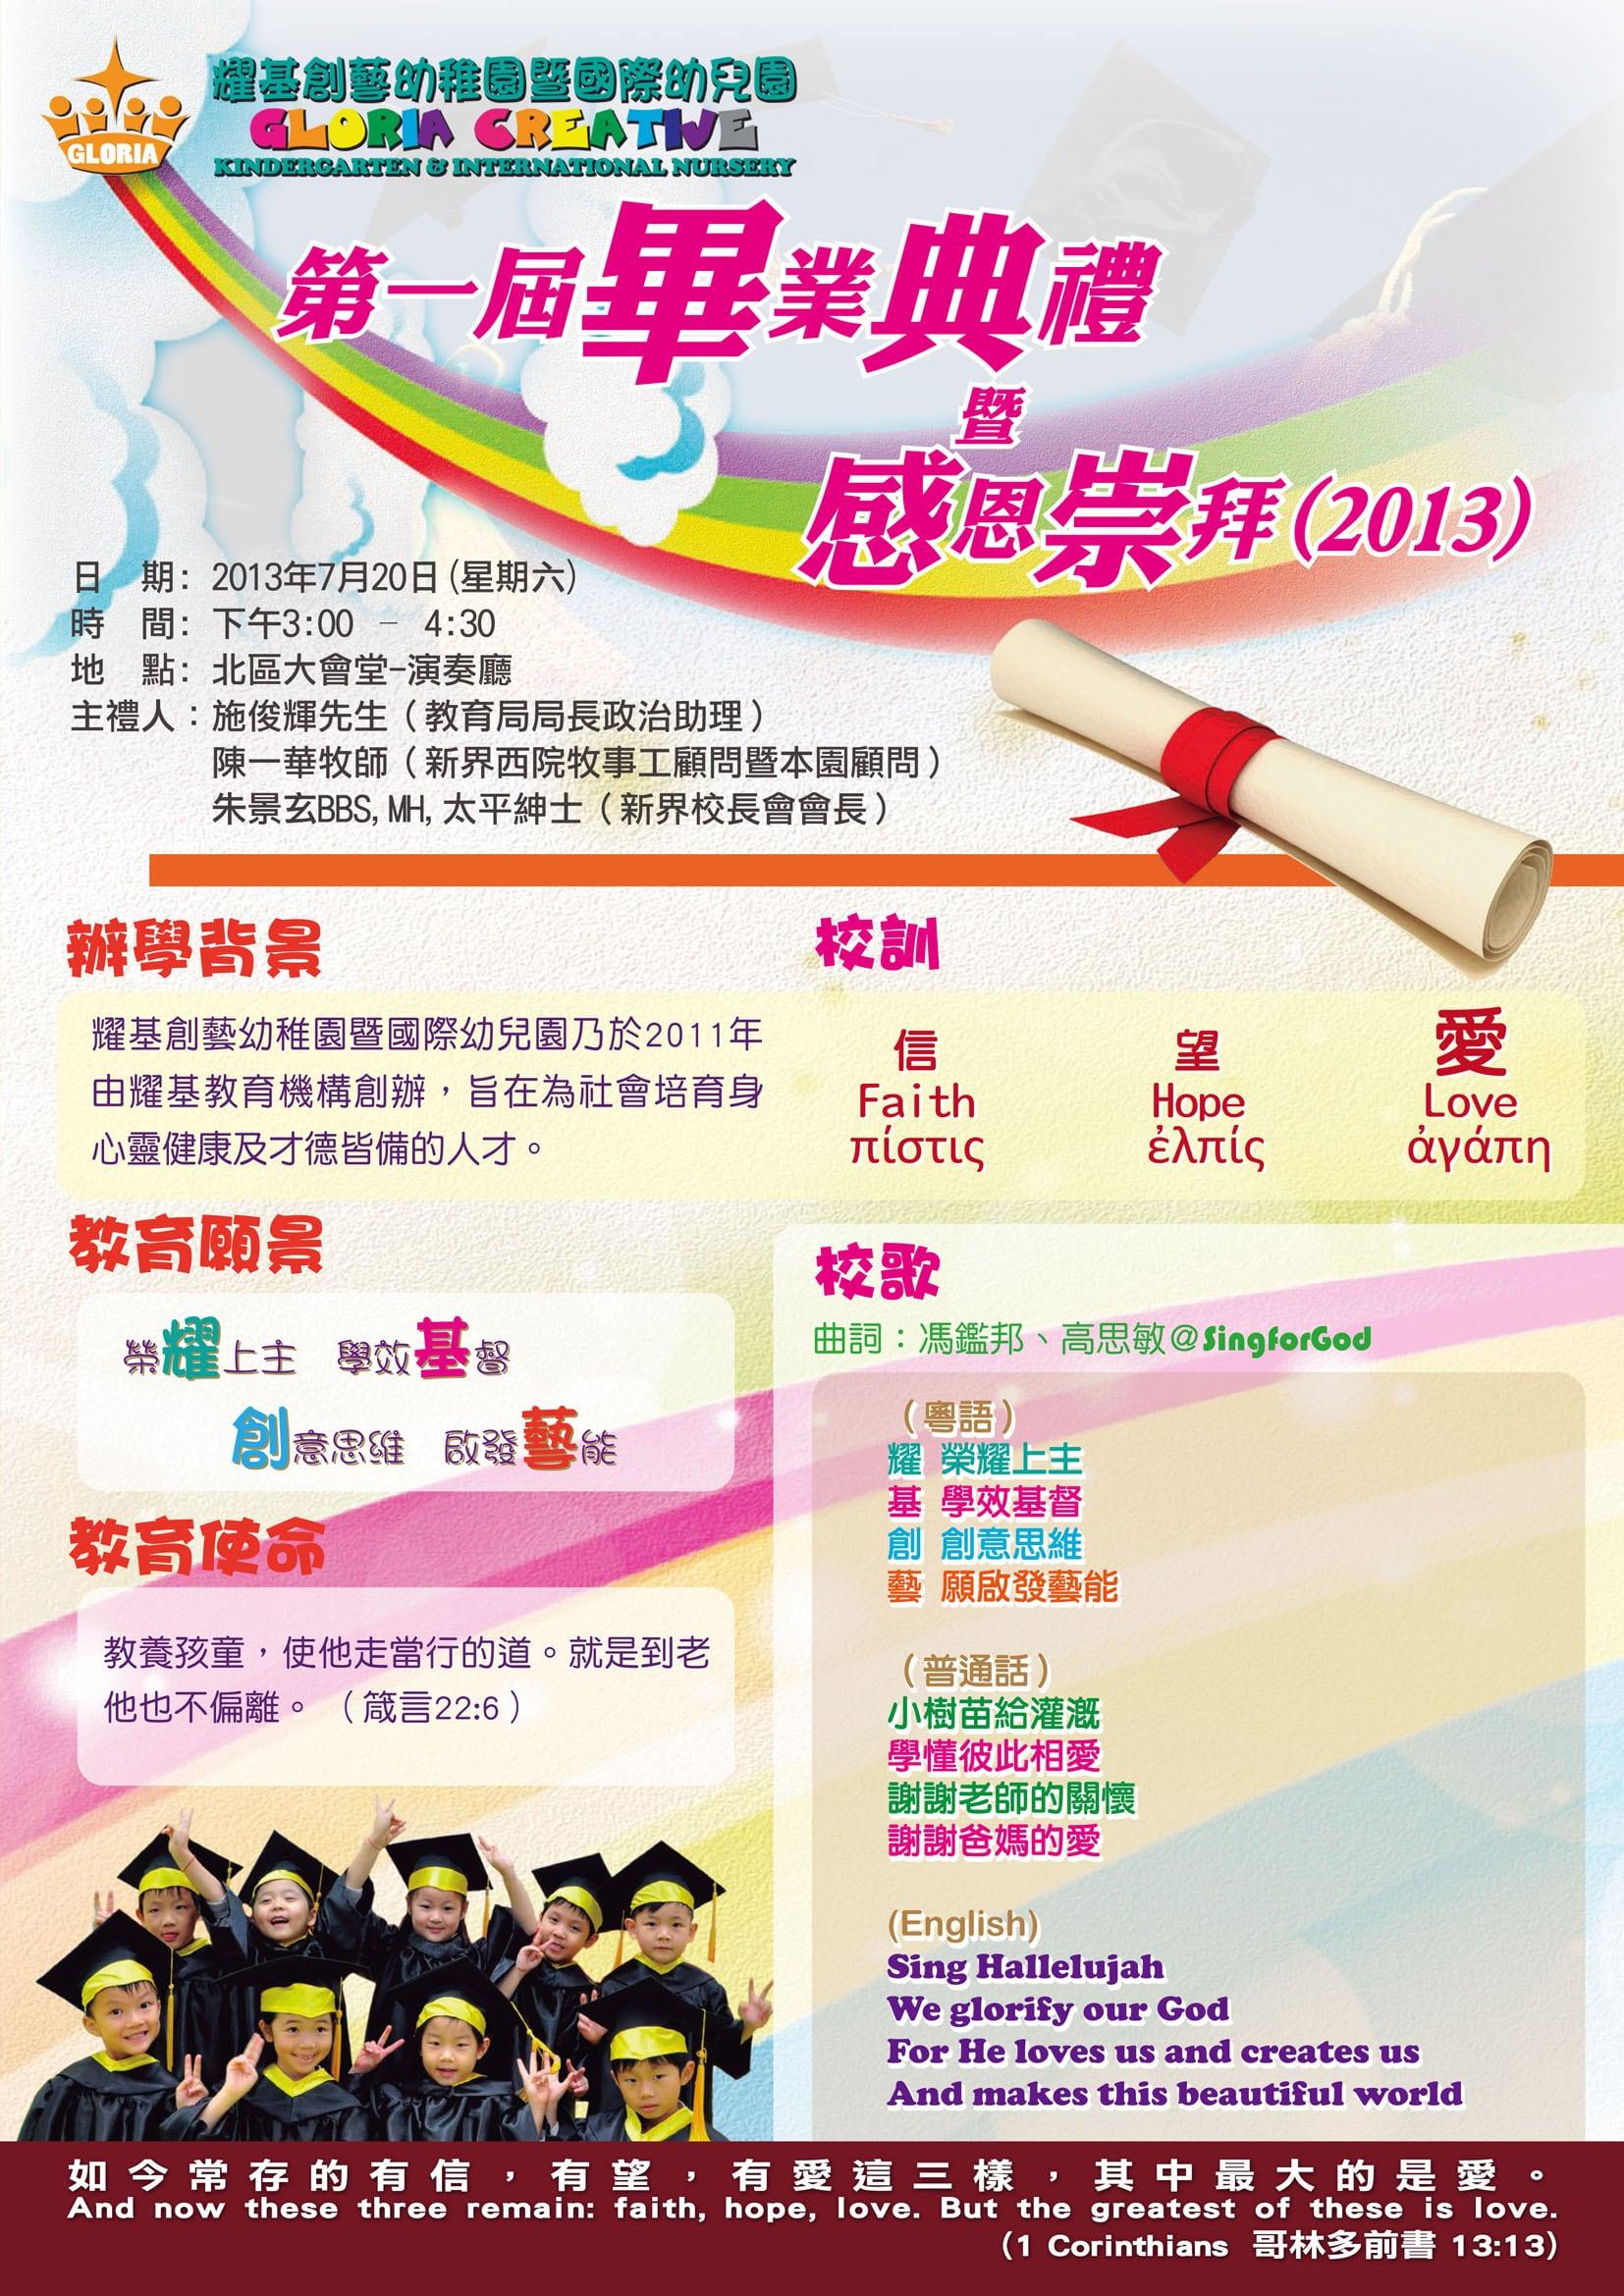 Photo of 第一屆畢業禮暨感恩崇拜(2013)特刊